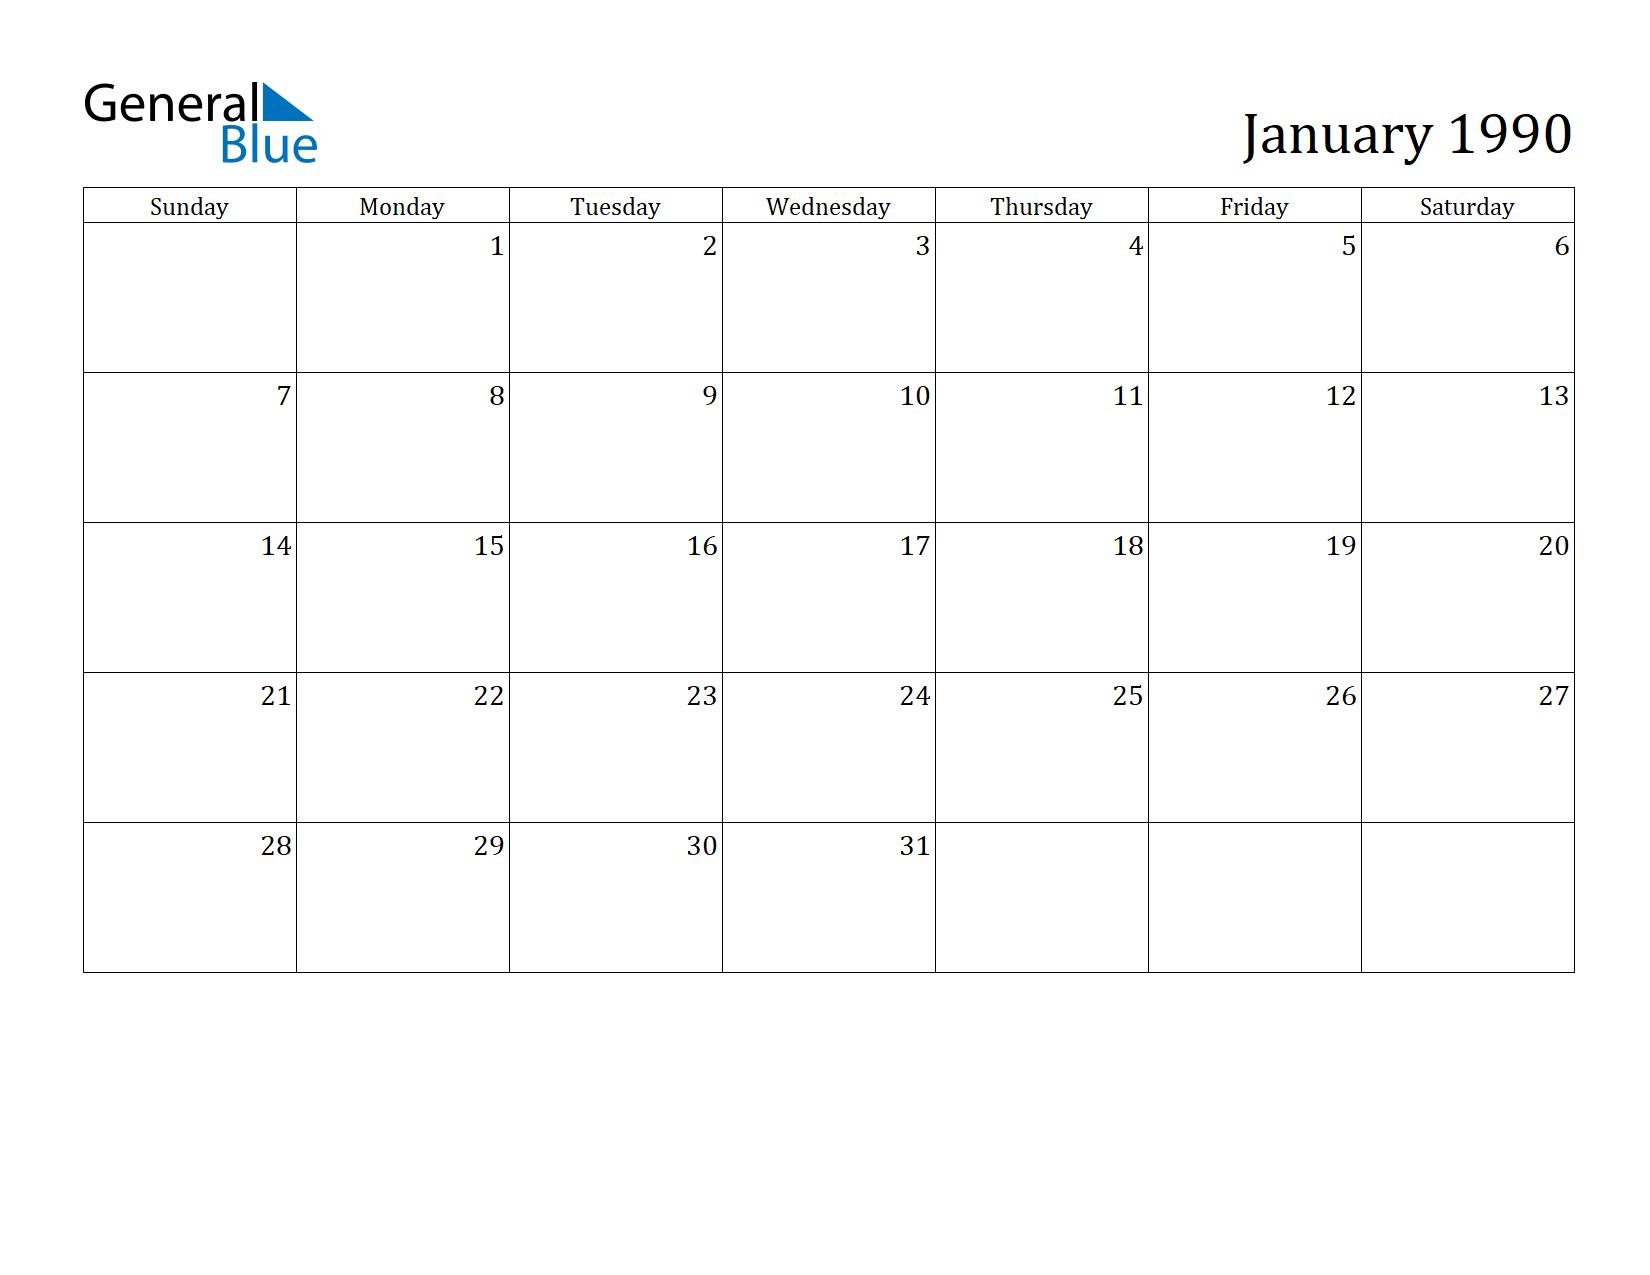 1990 Calendar.January 1990 Calendar General Blue